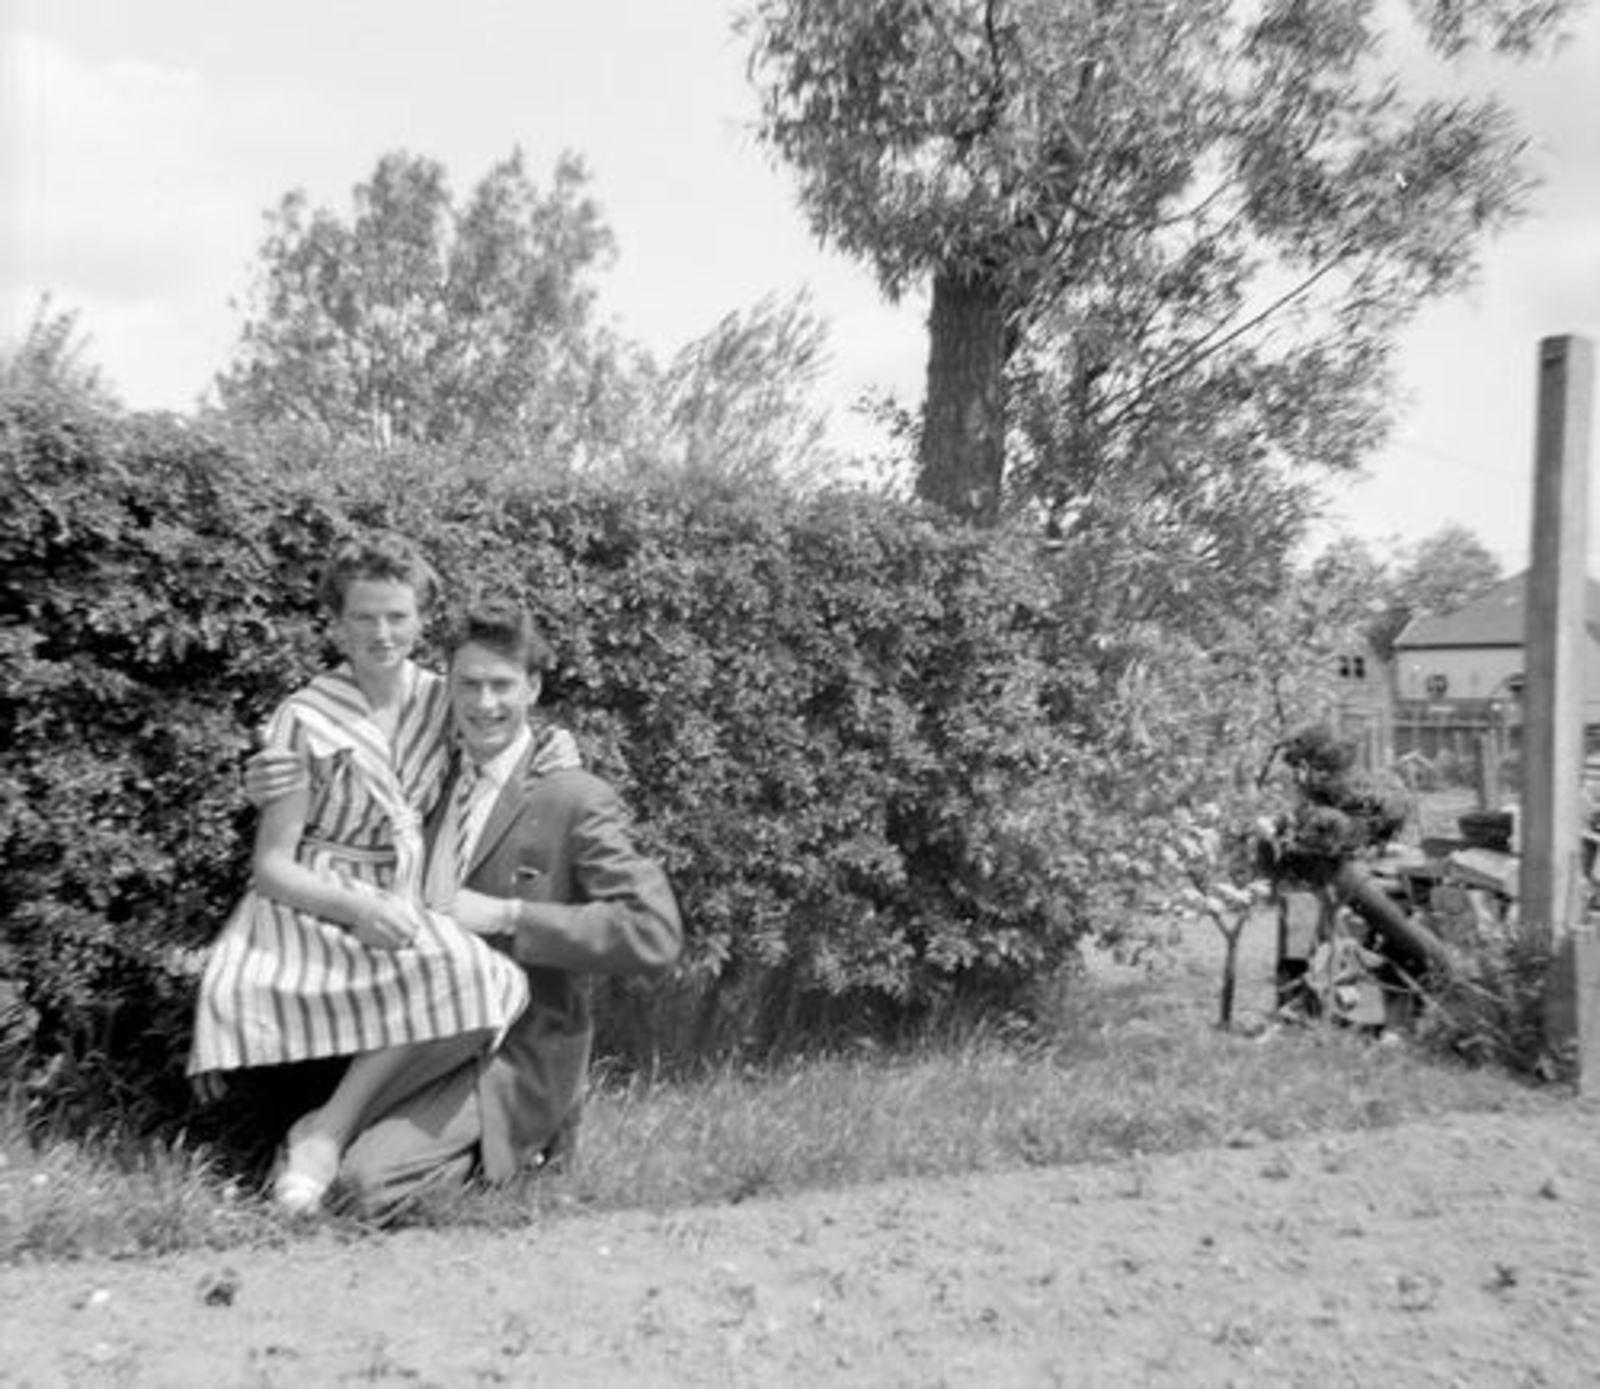 Koeckhoven Cor 1939 1948-61 in Tuin met Joke Koeckhoven-v Tol